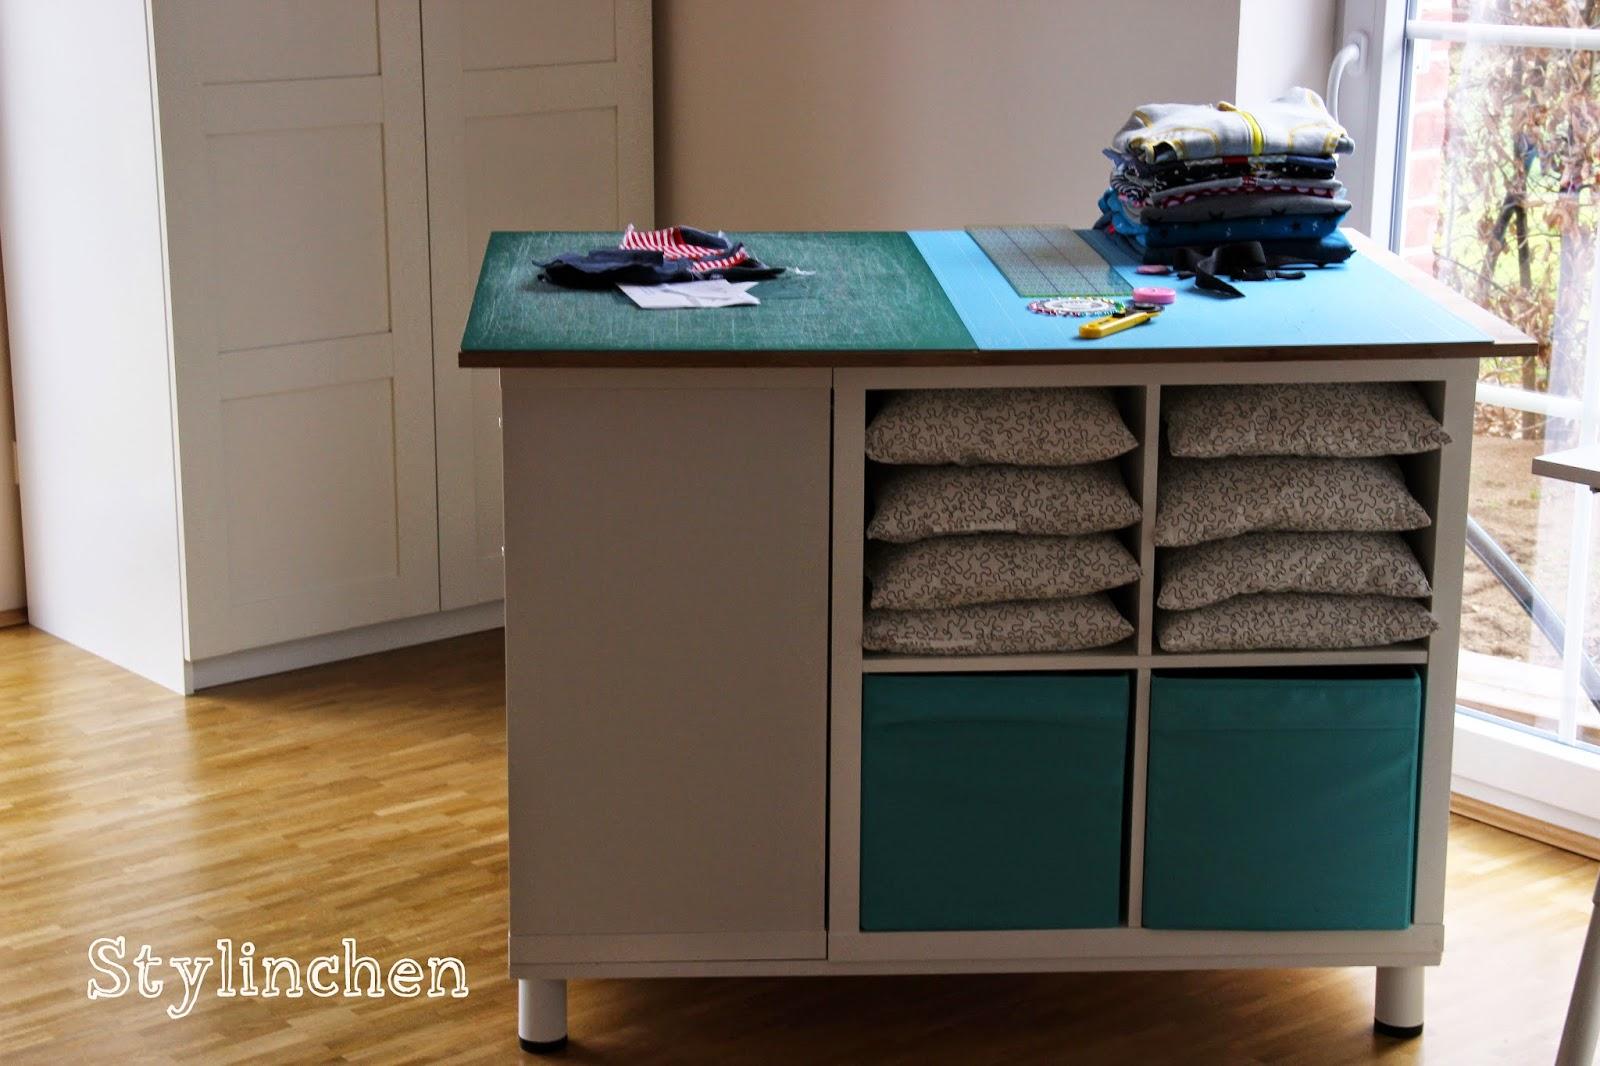 stylinchen mein n hzimmer mein lieblingsort. Black Bedroom Furniture Sets. Home Design Ideas